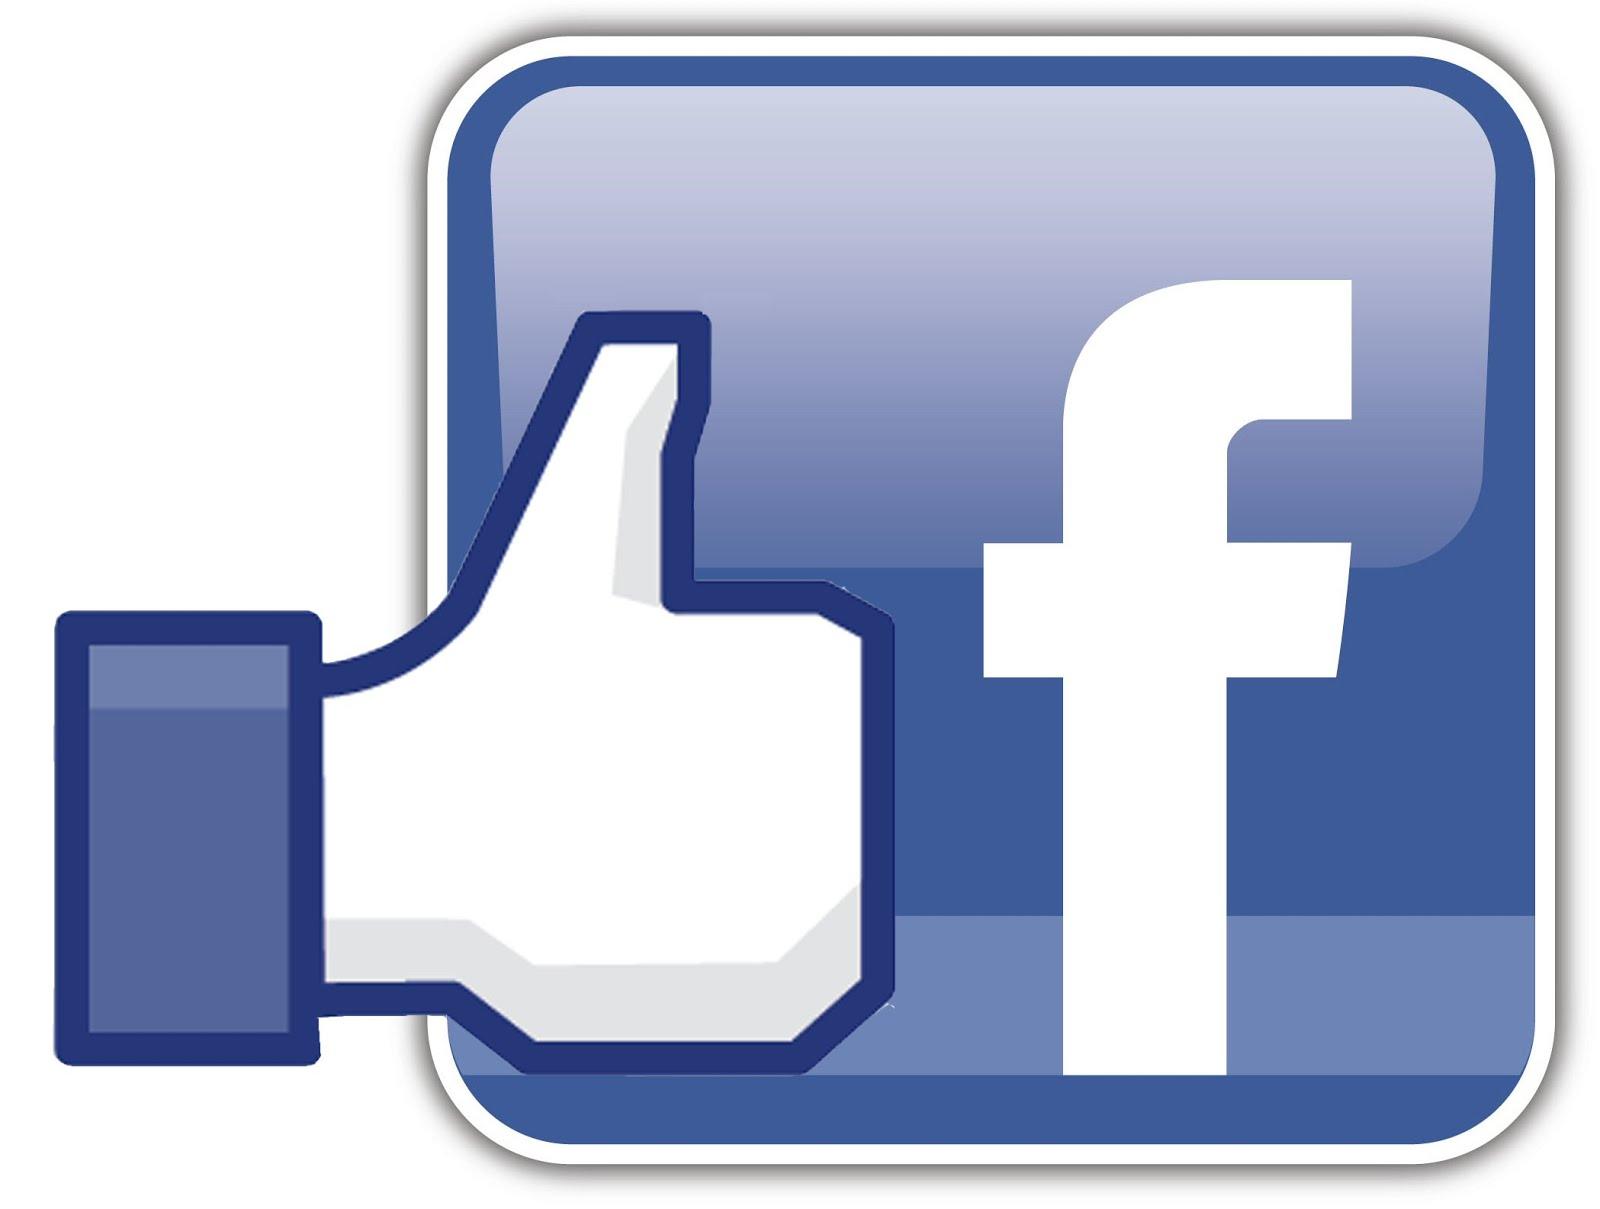 Facebook clipart new. Free download clip art